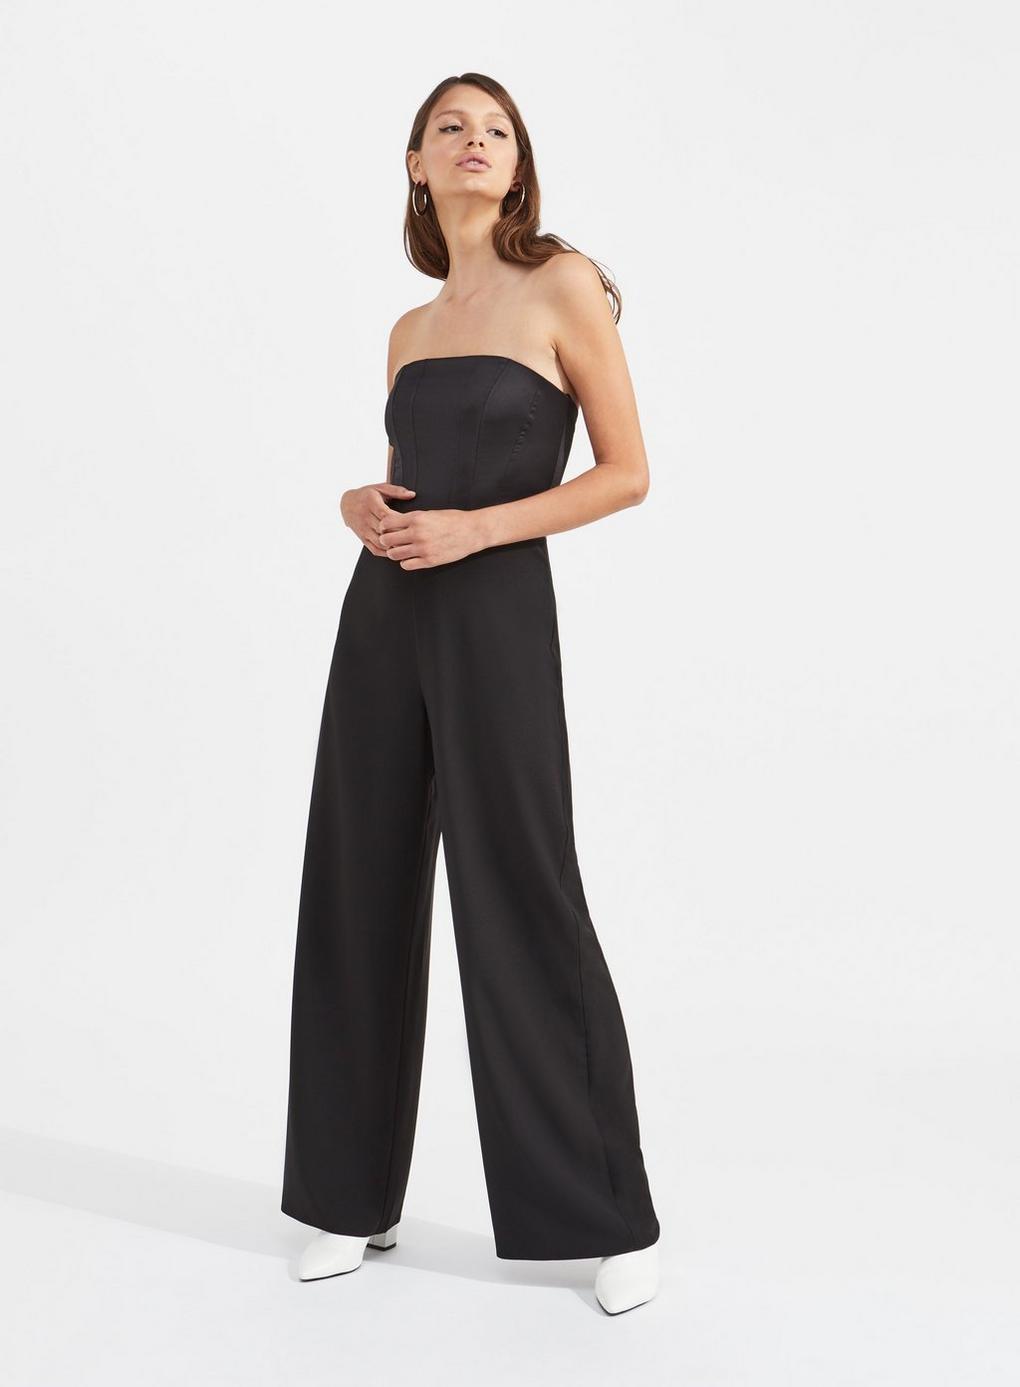 9c49bab17f2 Lyst - Miss Selfridge Black Bandeau Boned Jumpsuit in Black